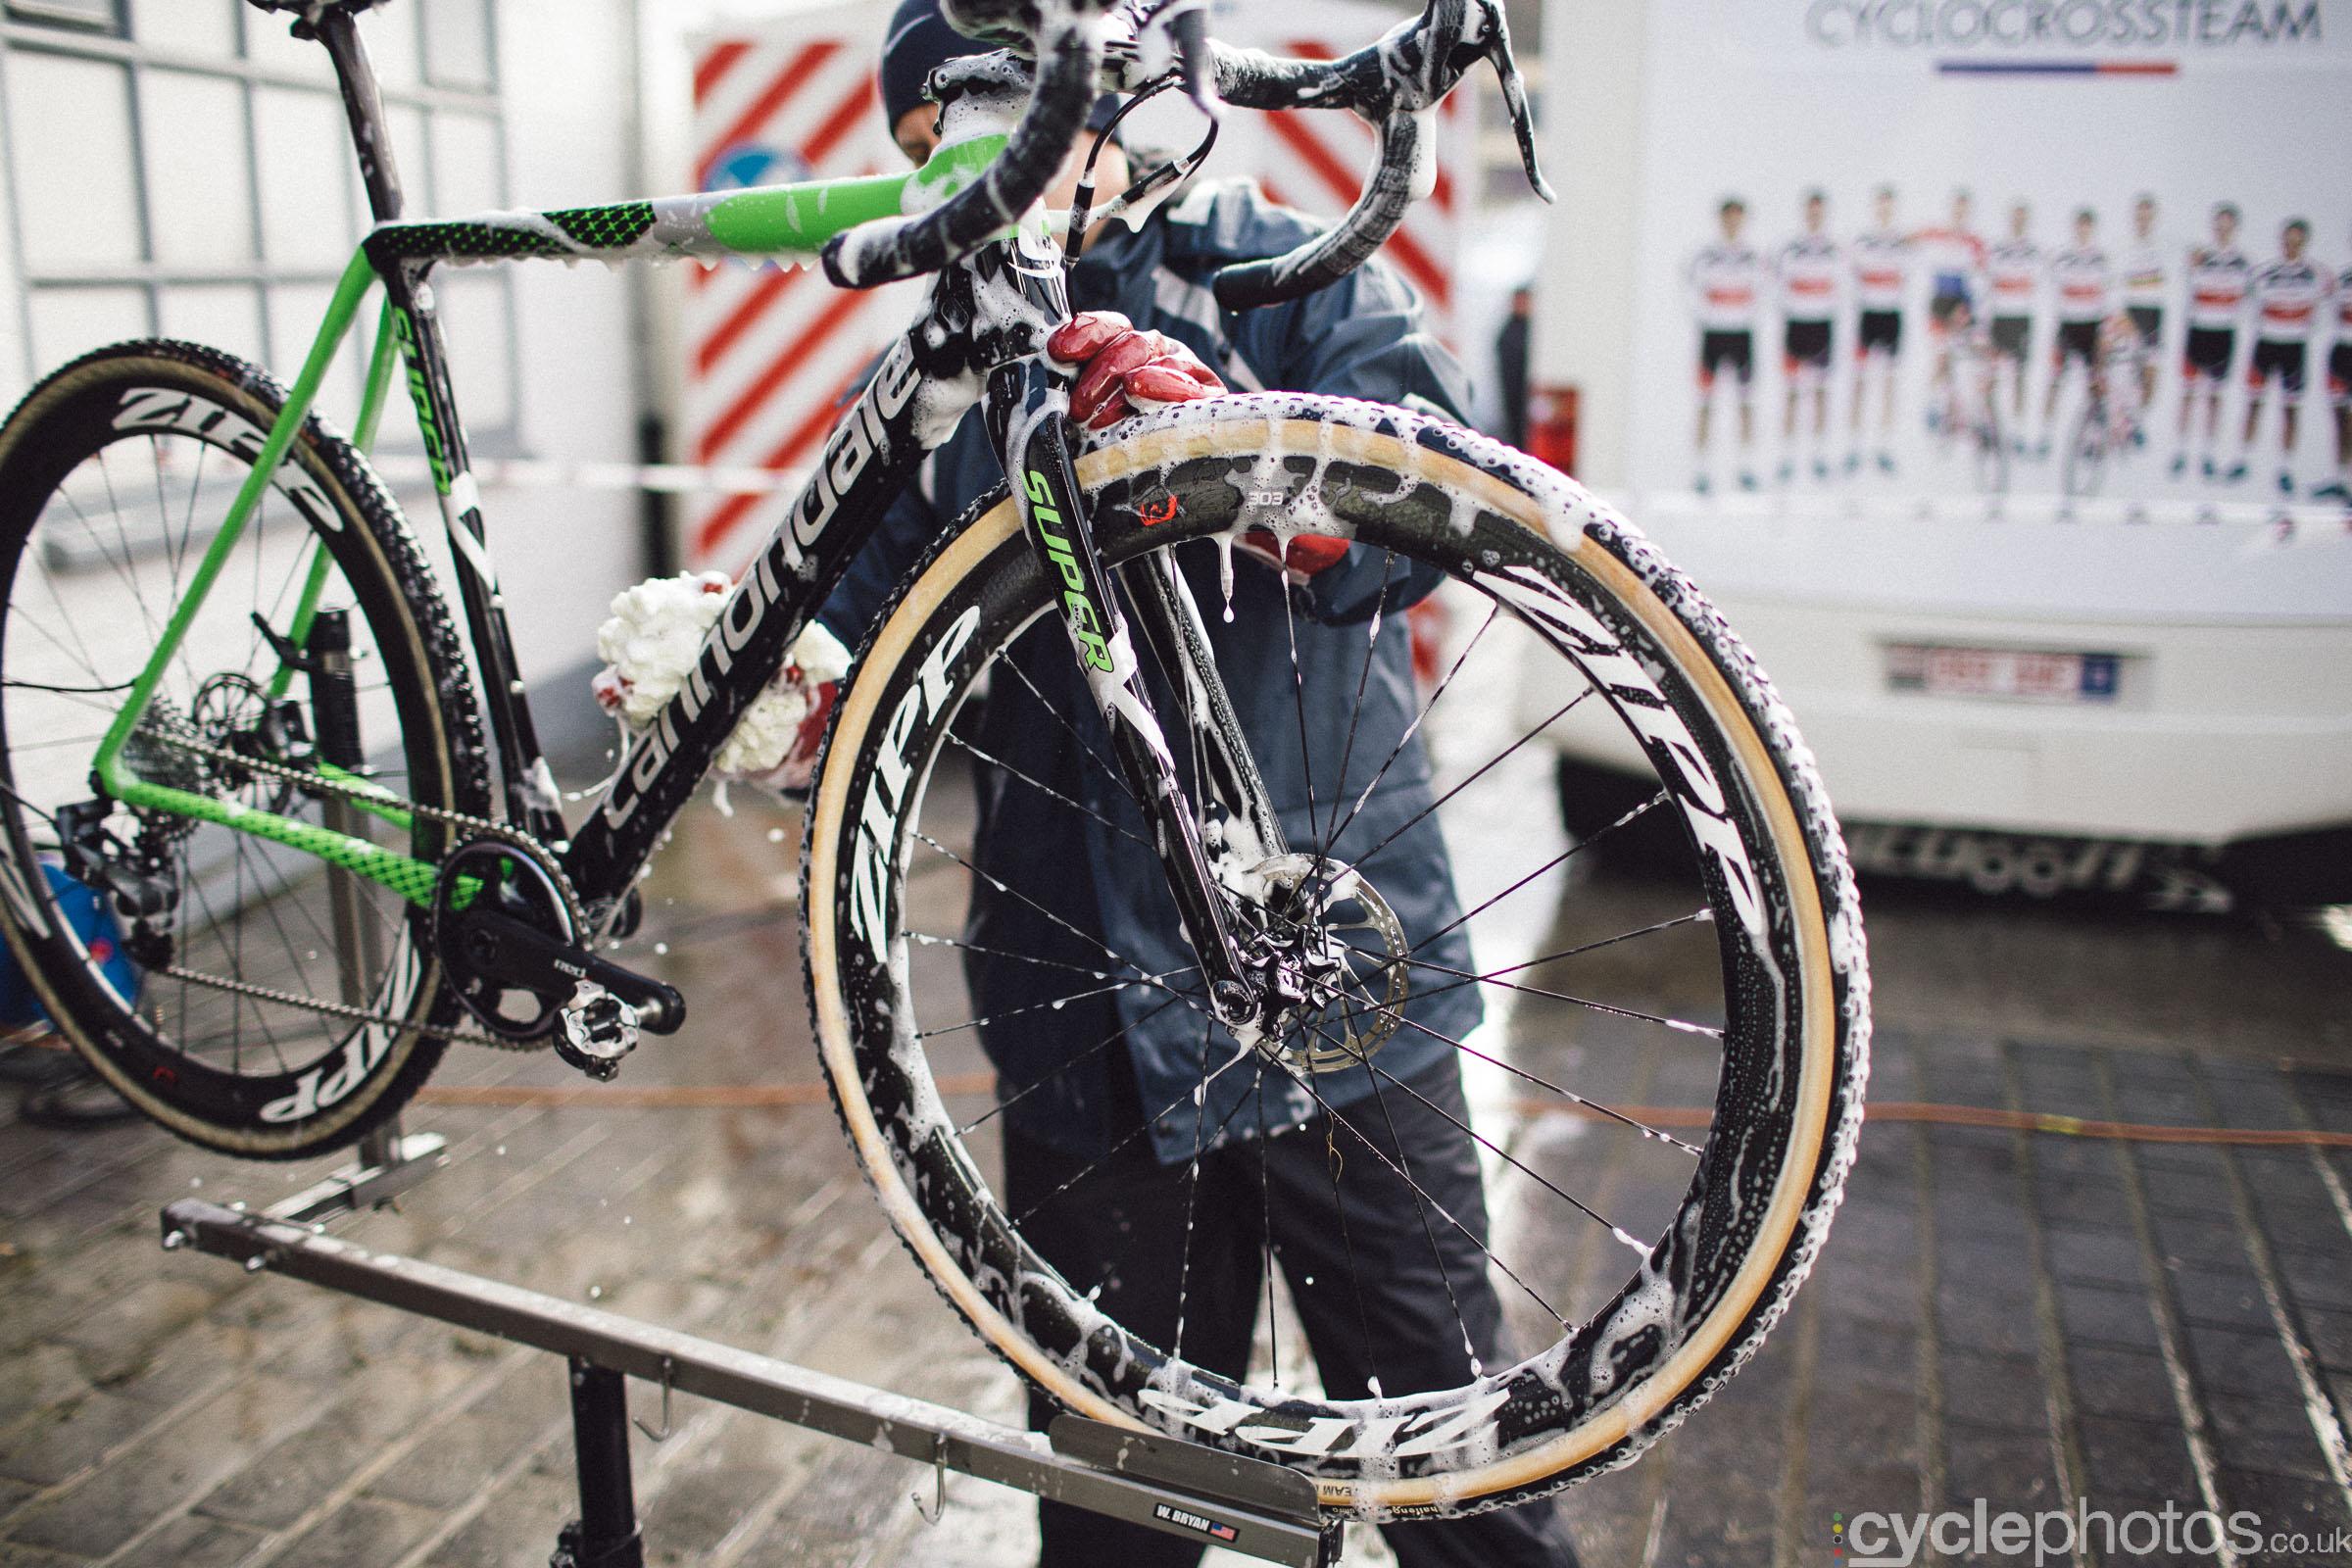 2016 - Druivencross, Overijse